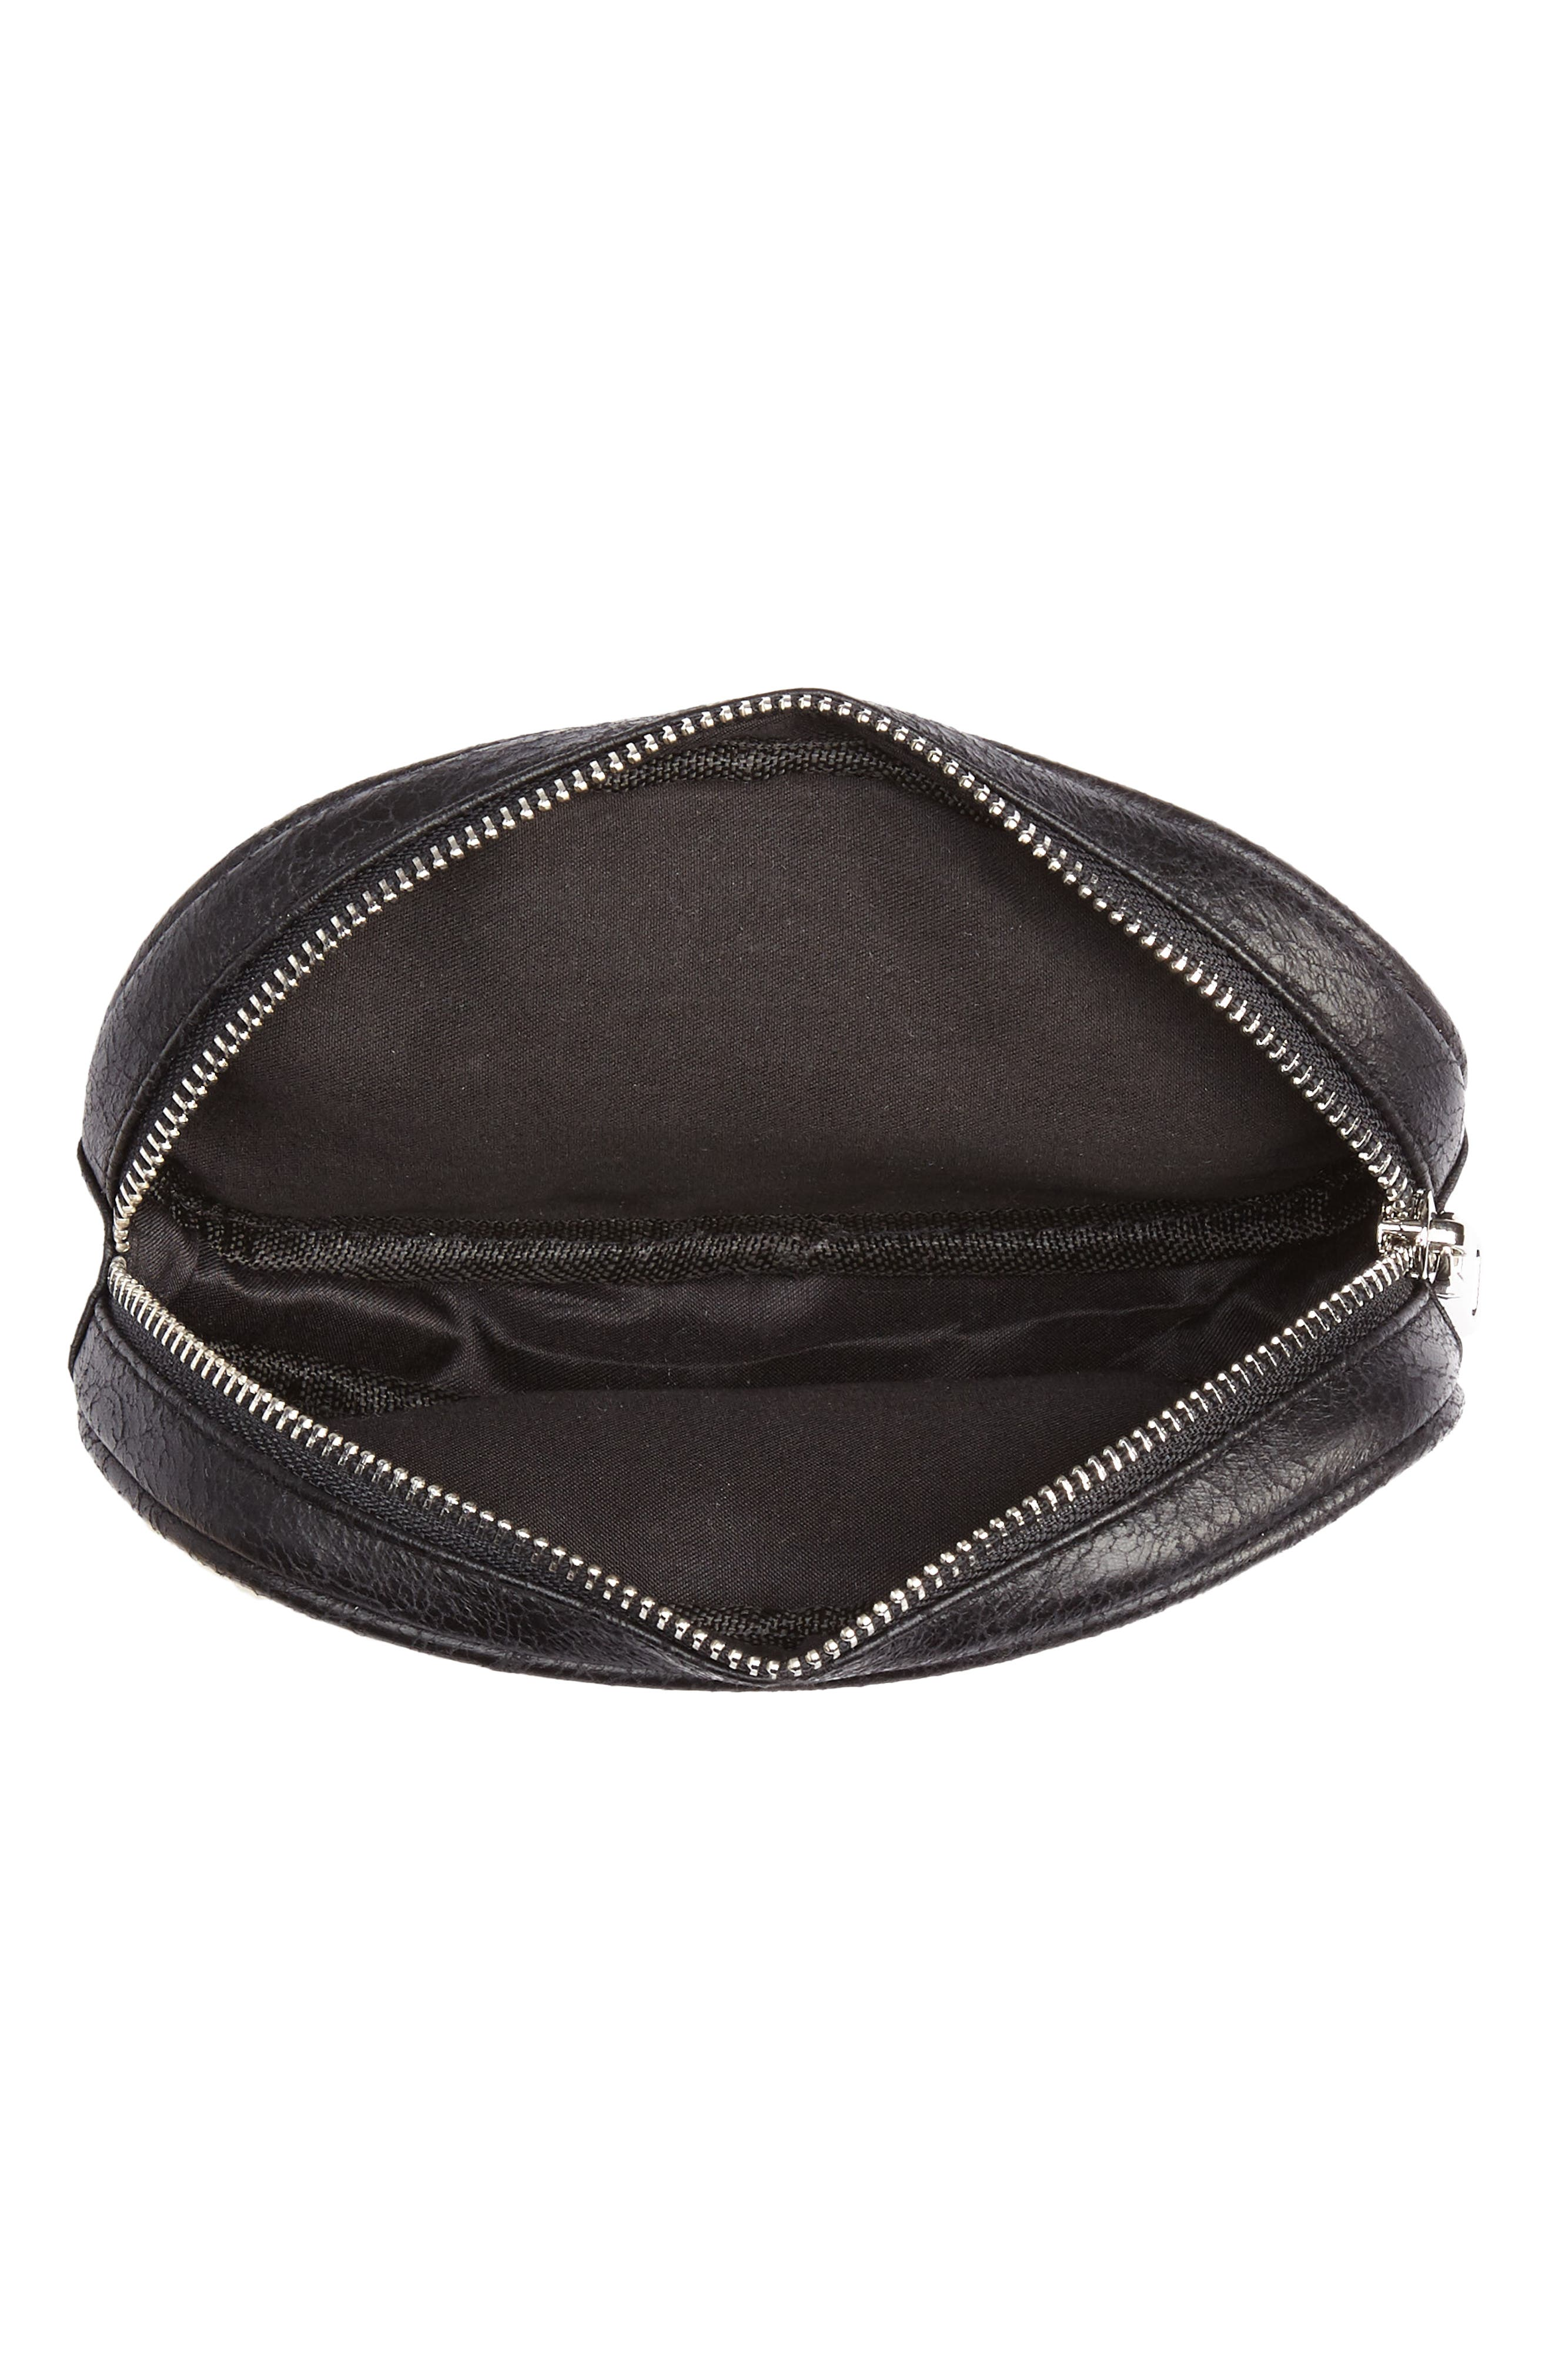 Faux Shearling Belt Bag,                             Alternate thumbnail 5, color,                             BLACK/ NATURAL